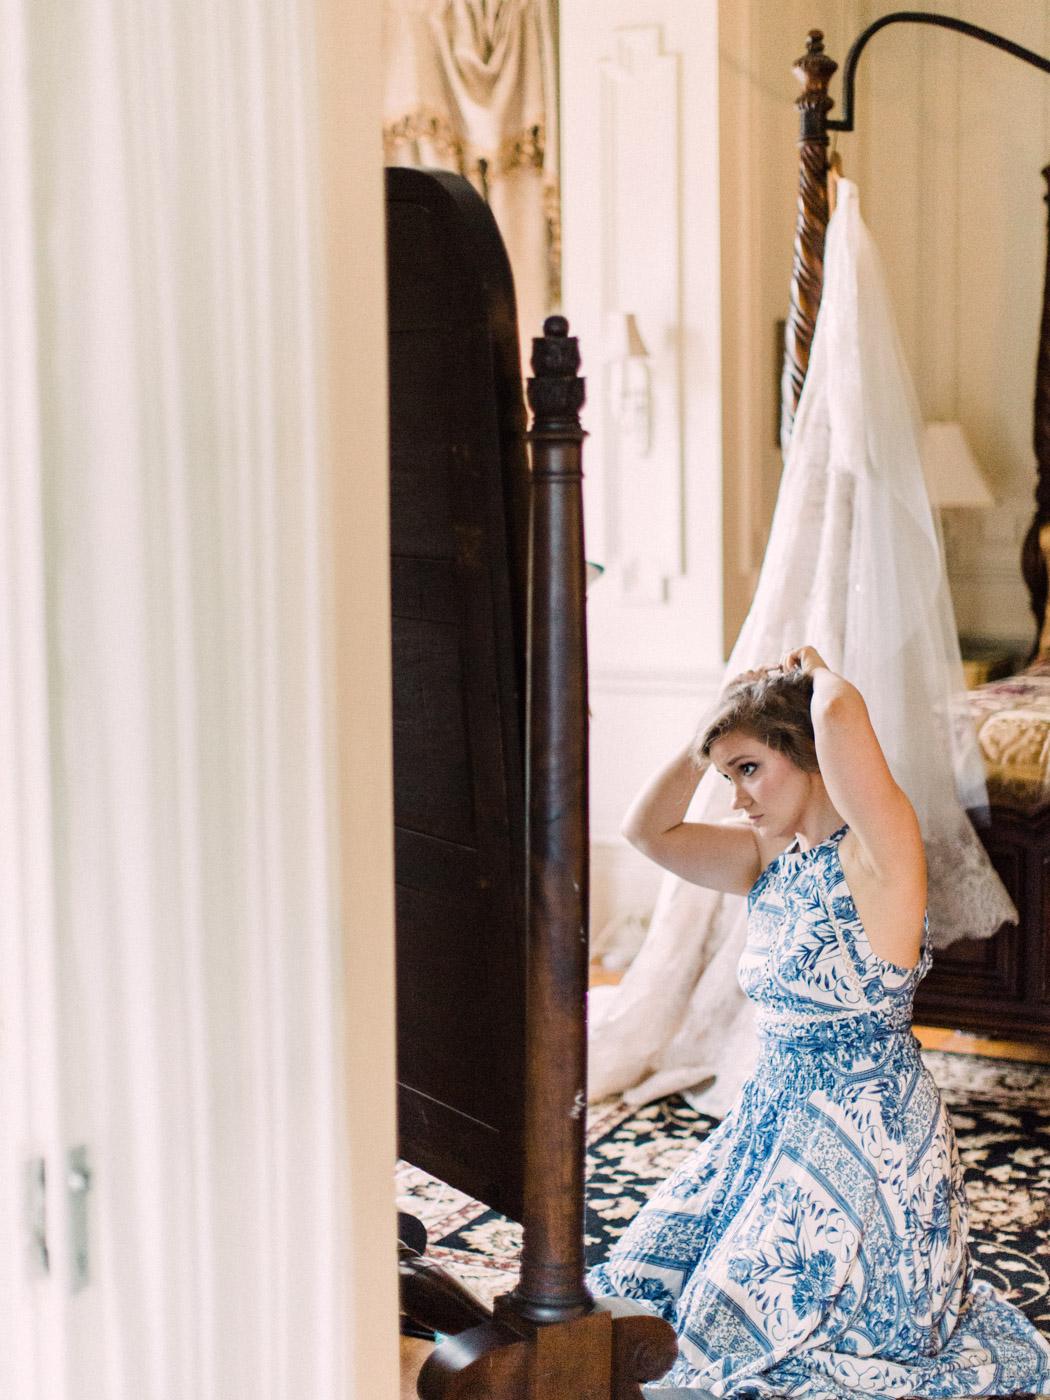 Toronto-wedding-photographer-intimate-classic-fine-art-elopement-ottawa15.jpg